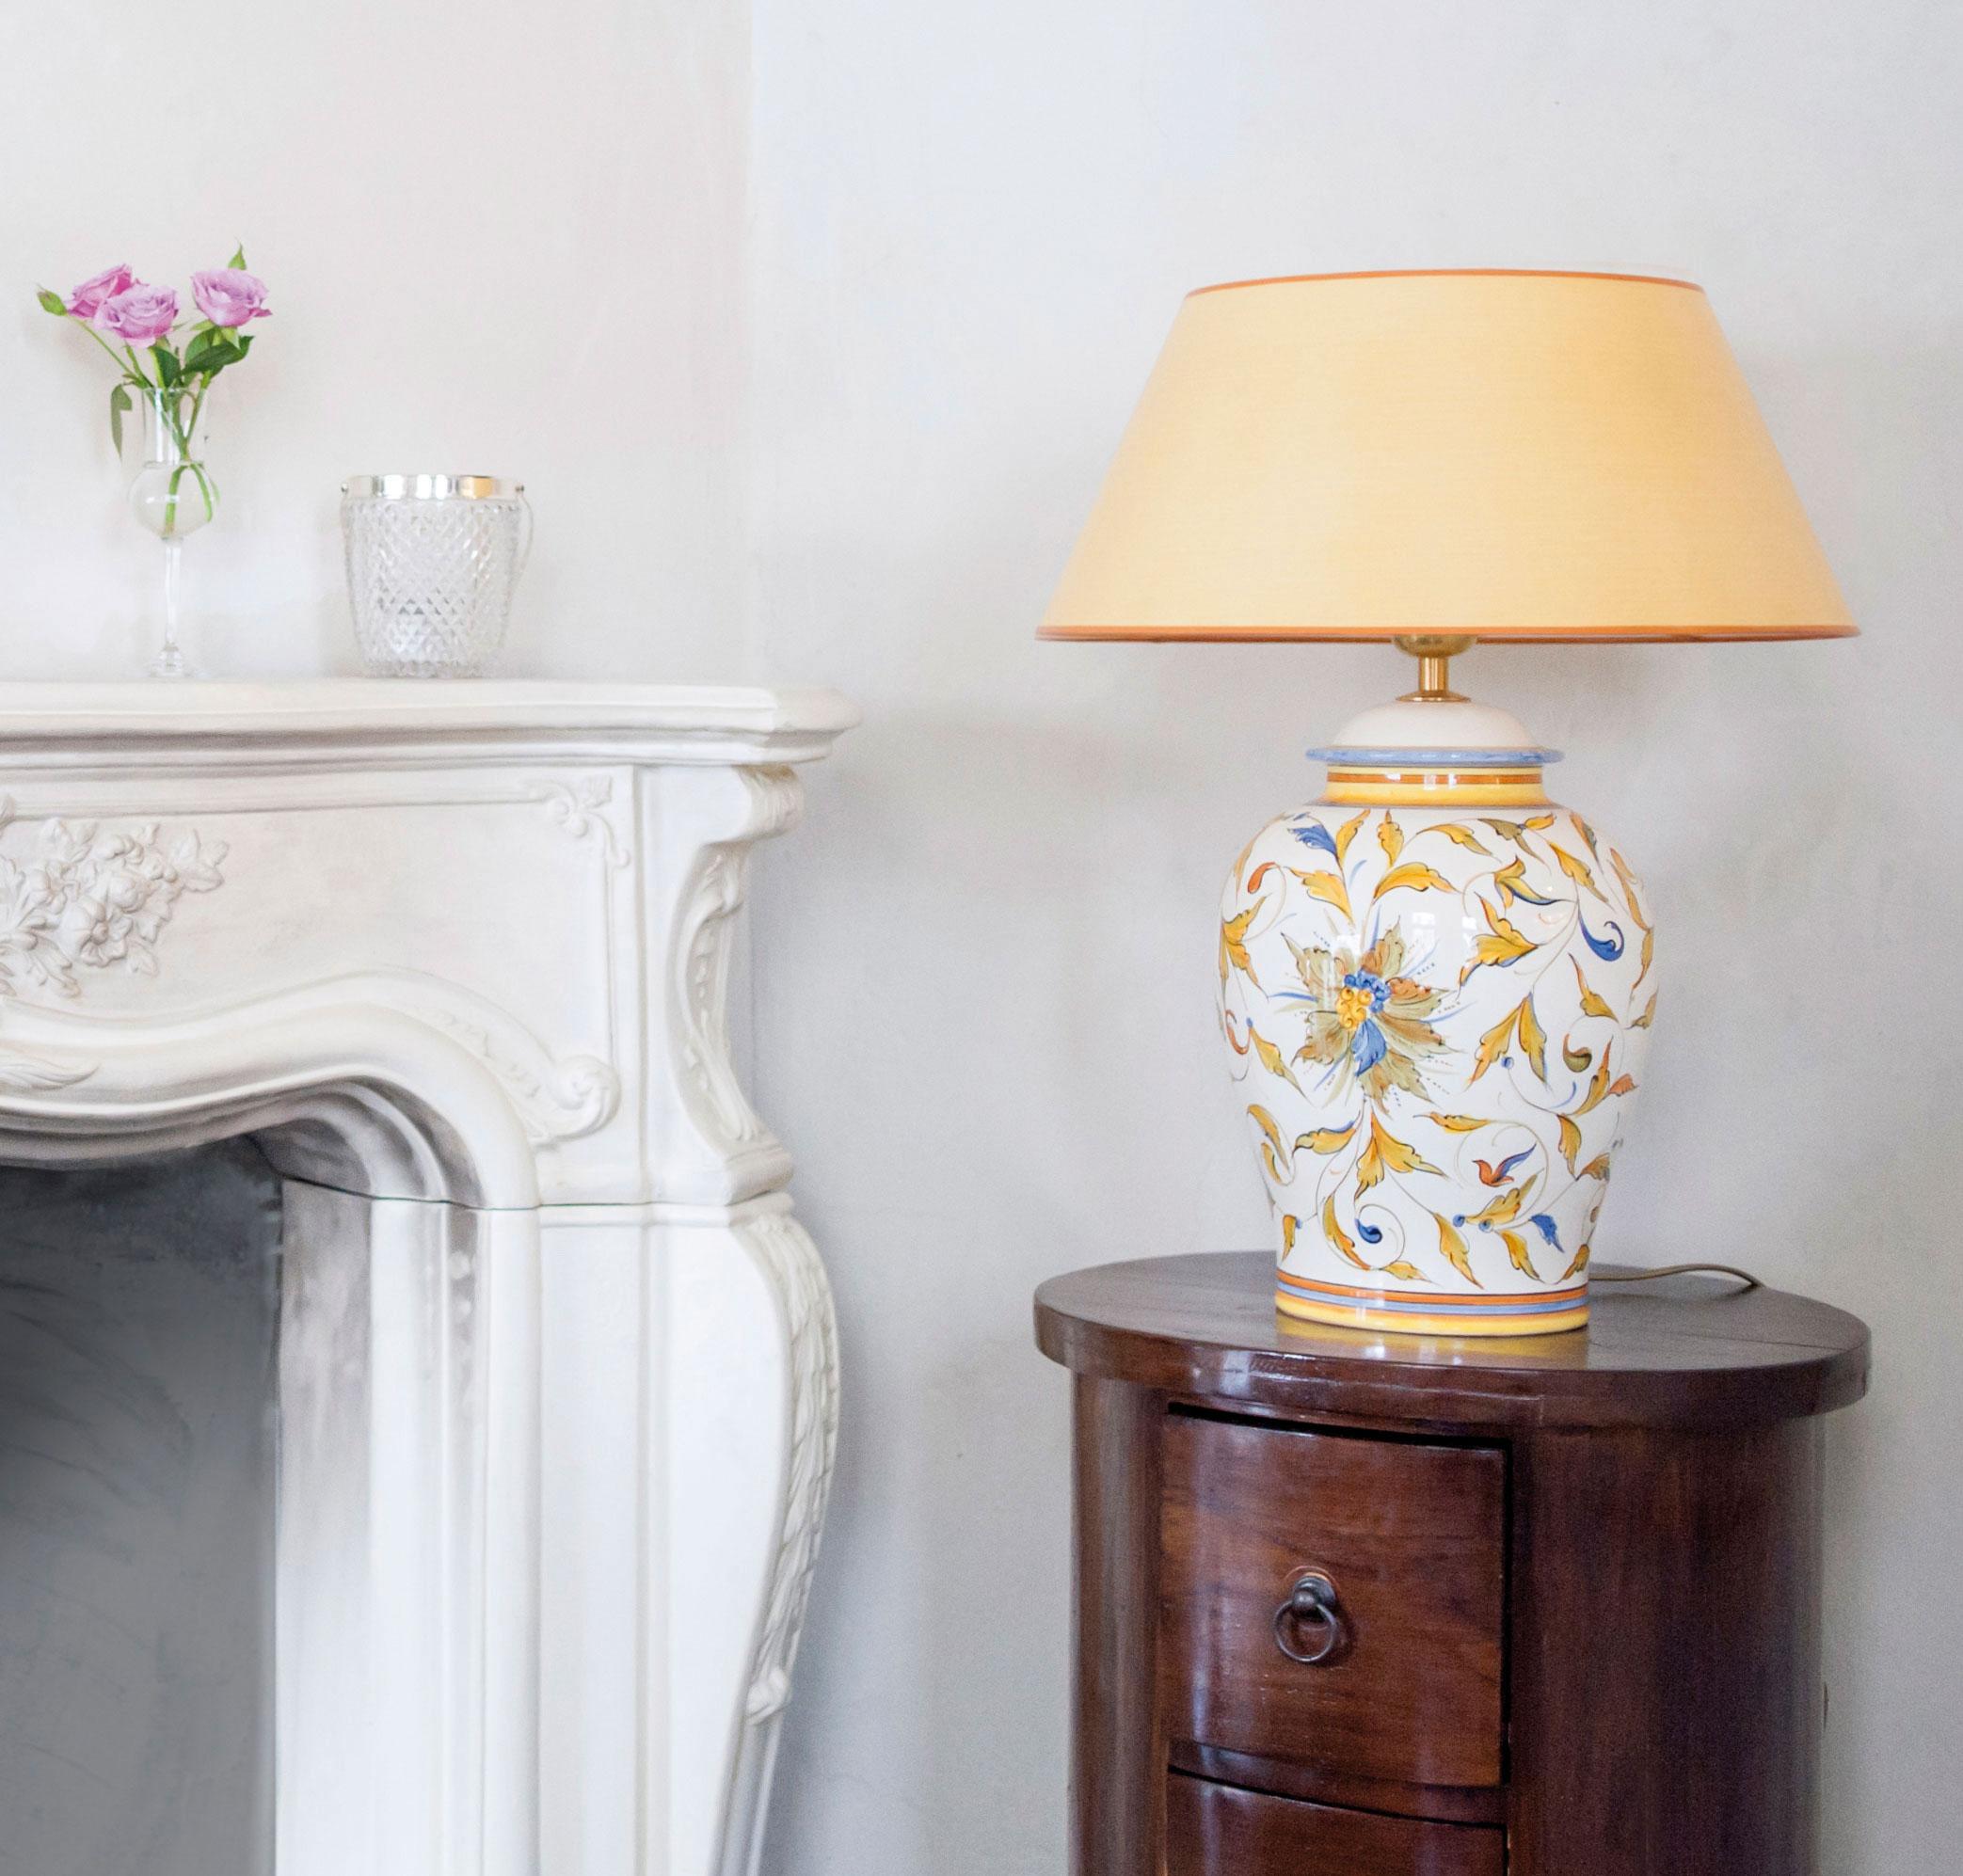 handgemalte keramik tischlampe raffaello mit gelbem. Black Bedroom Furniture Sets. Home Design Ideas